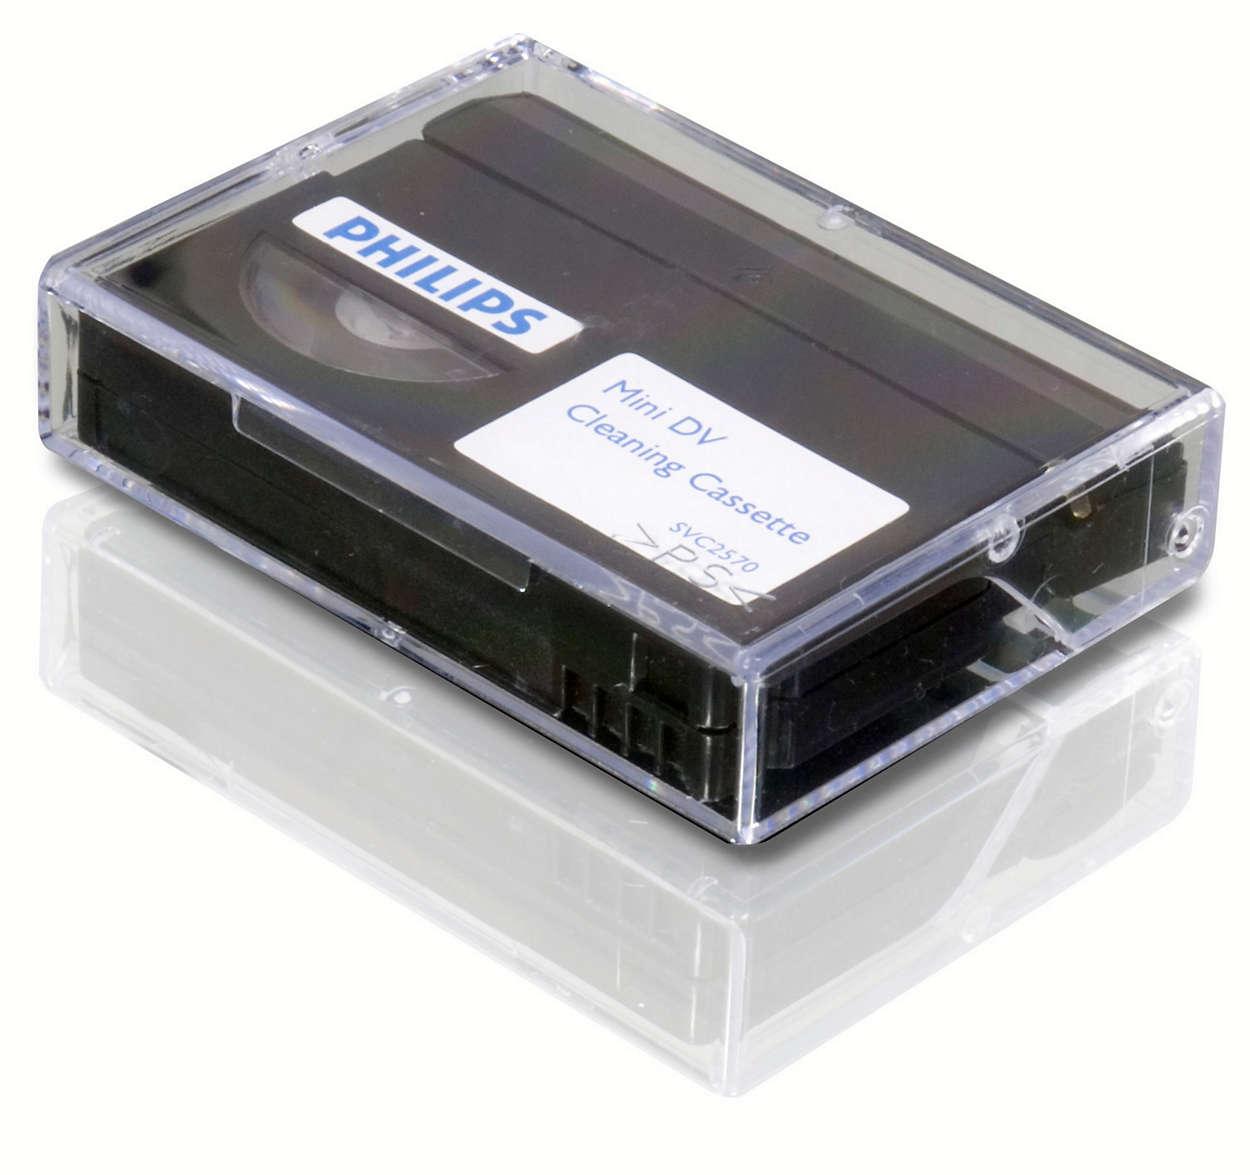 Puhdista mini-DV-kamerasi